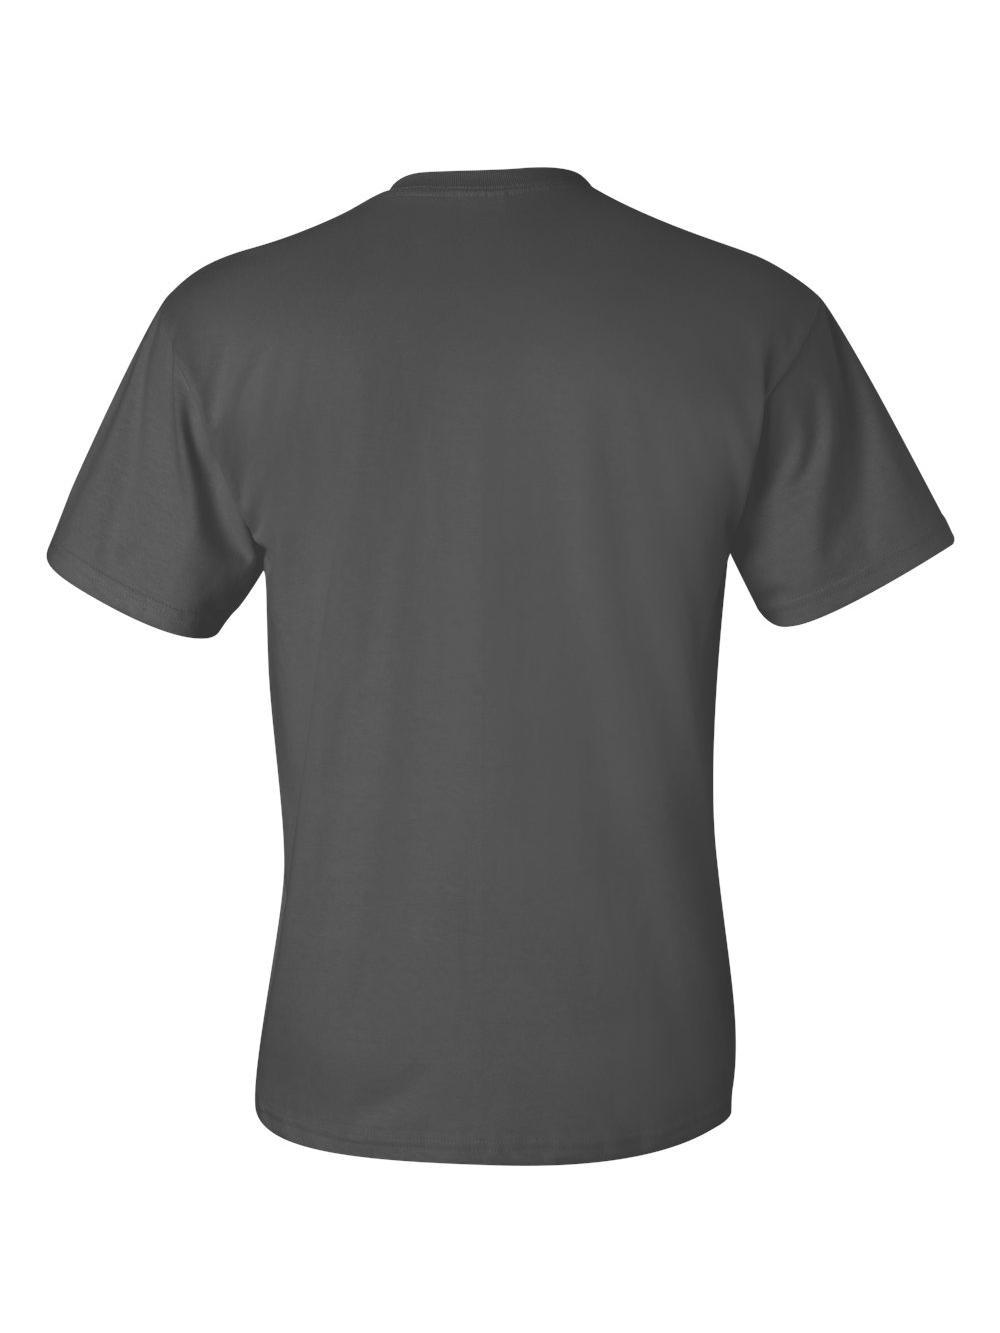 Gildan-Ultra-Cotton-T-Shirt-with-a-Pocket-2300 thumbnail 10